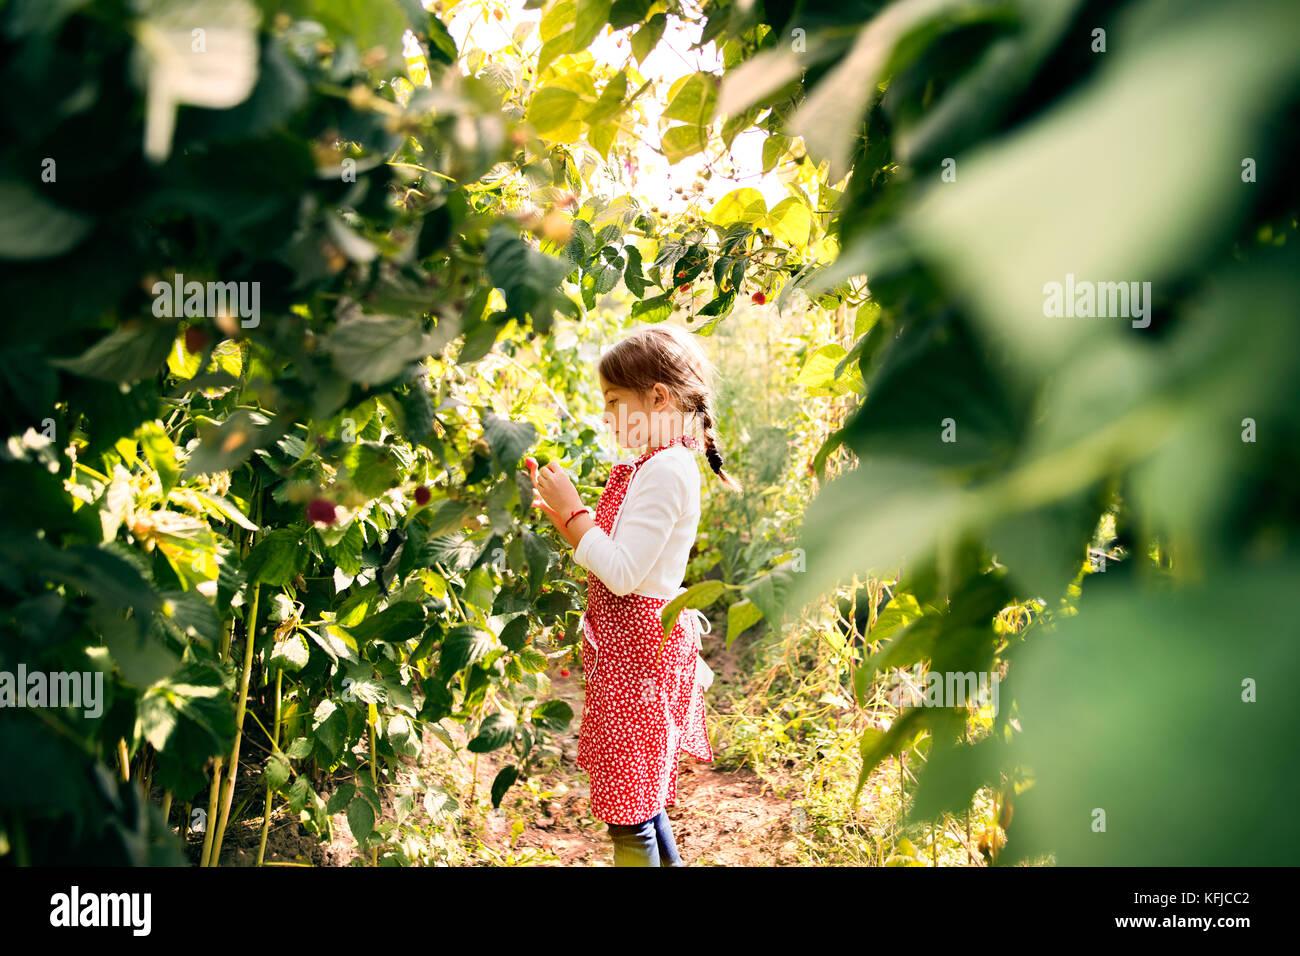 Small girl gardening in the backyard garden. - Stock Image